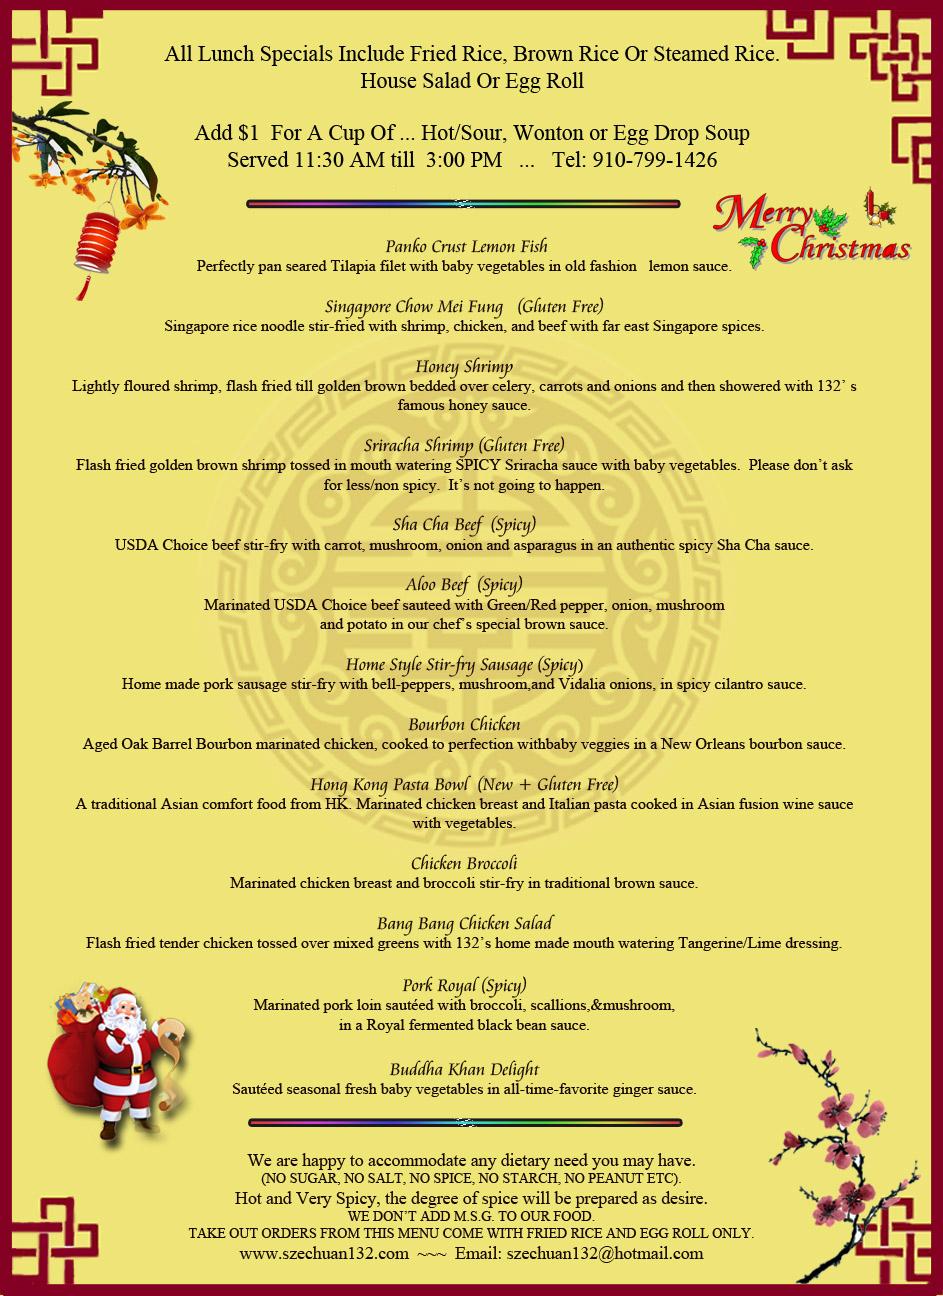 12-18-17 Lunch menu